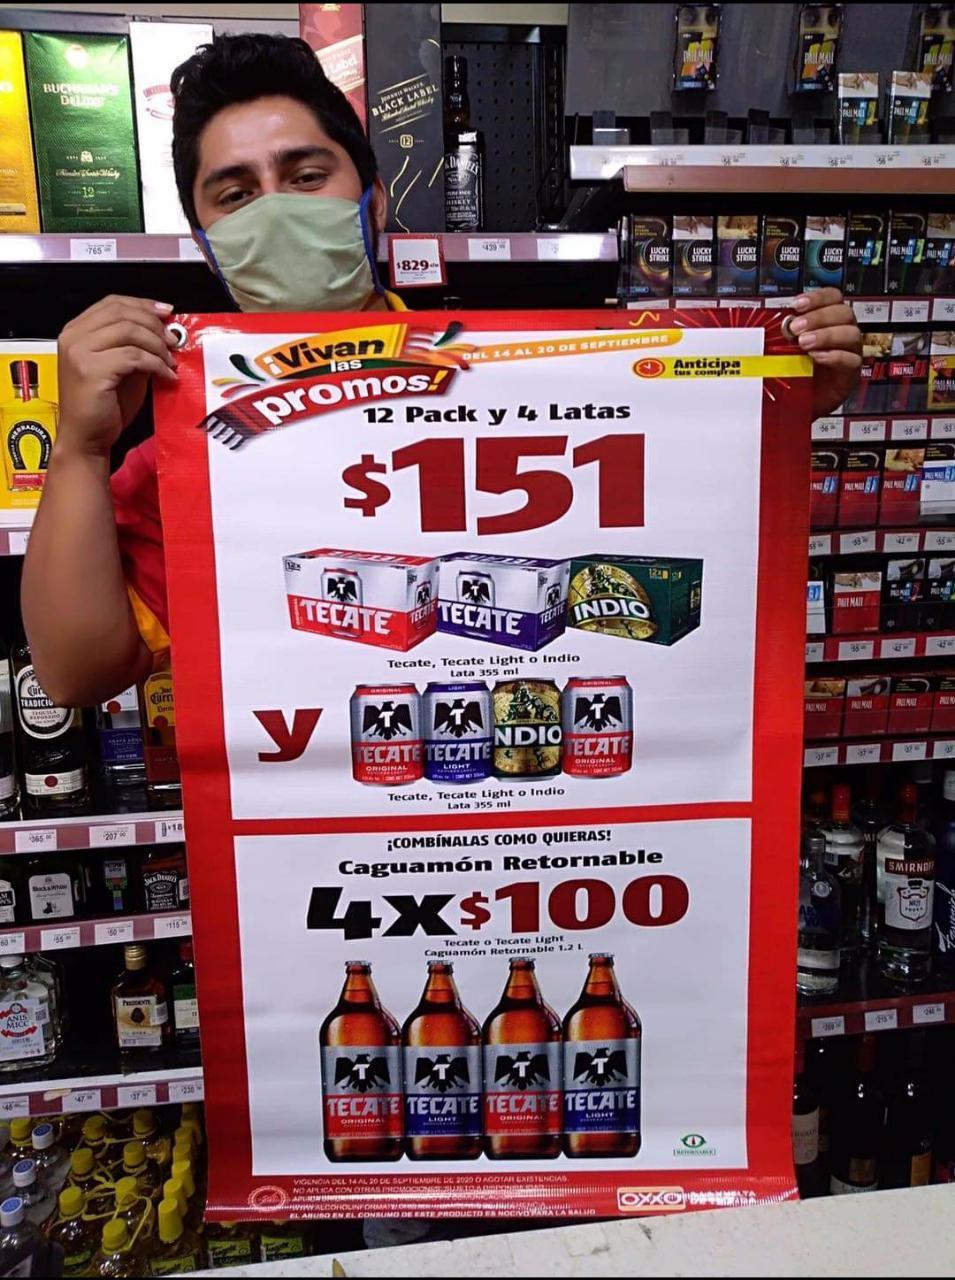 oxxo: 12 de cerveza mas 4 lastas por 151 pesos 4 caguamones por 100 pesos